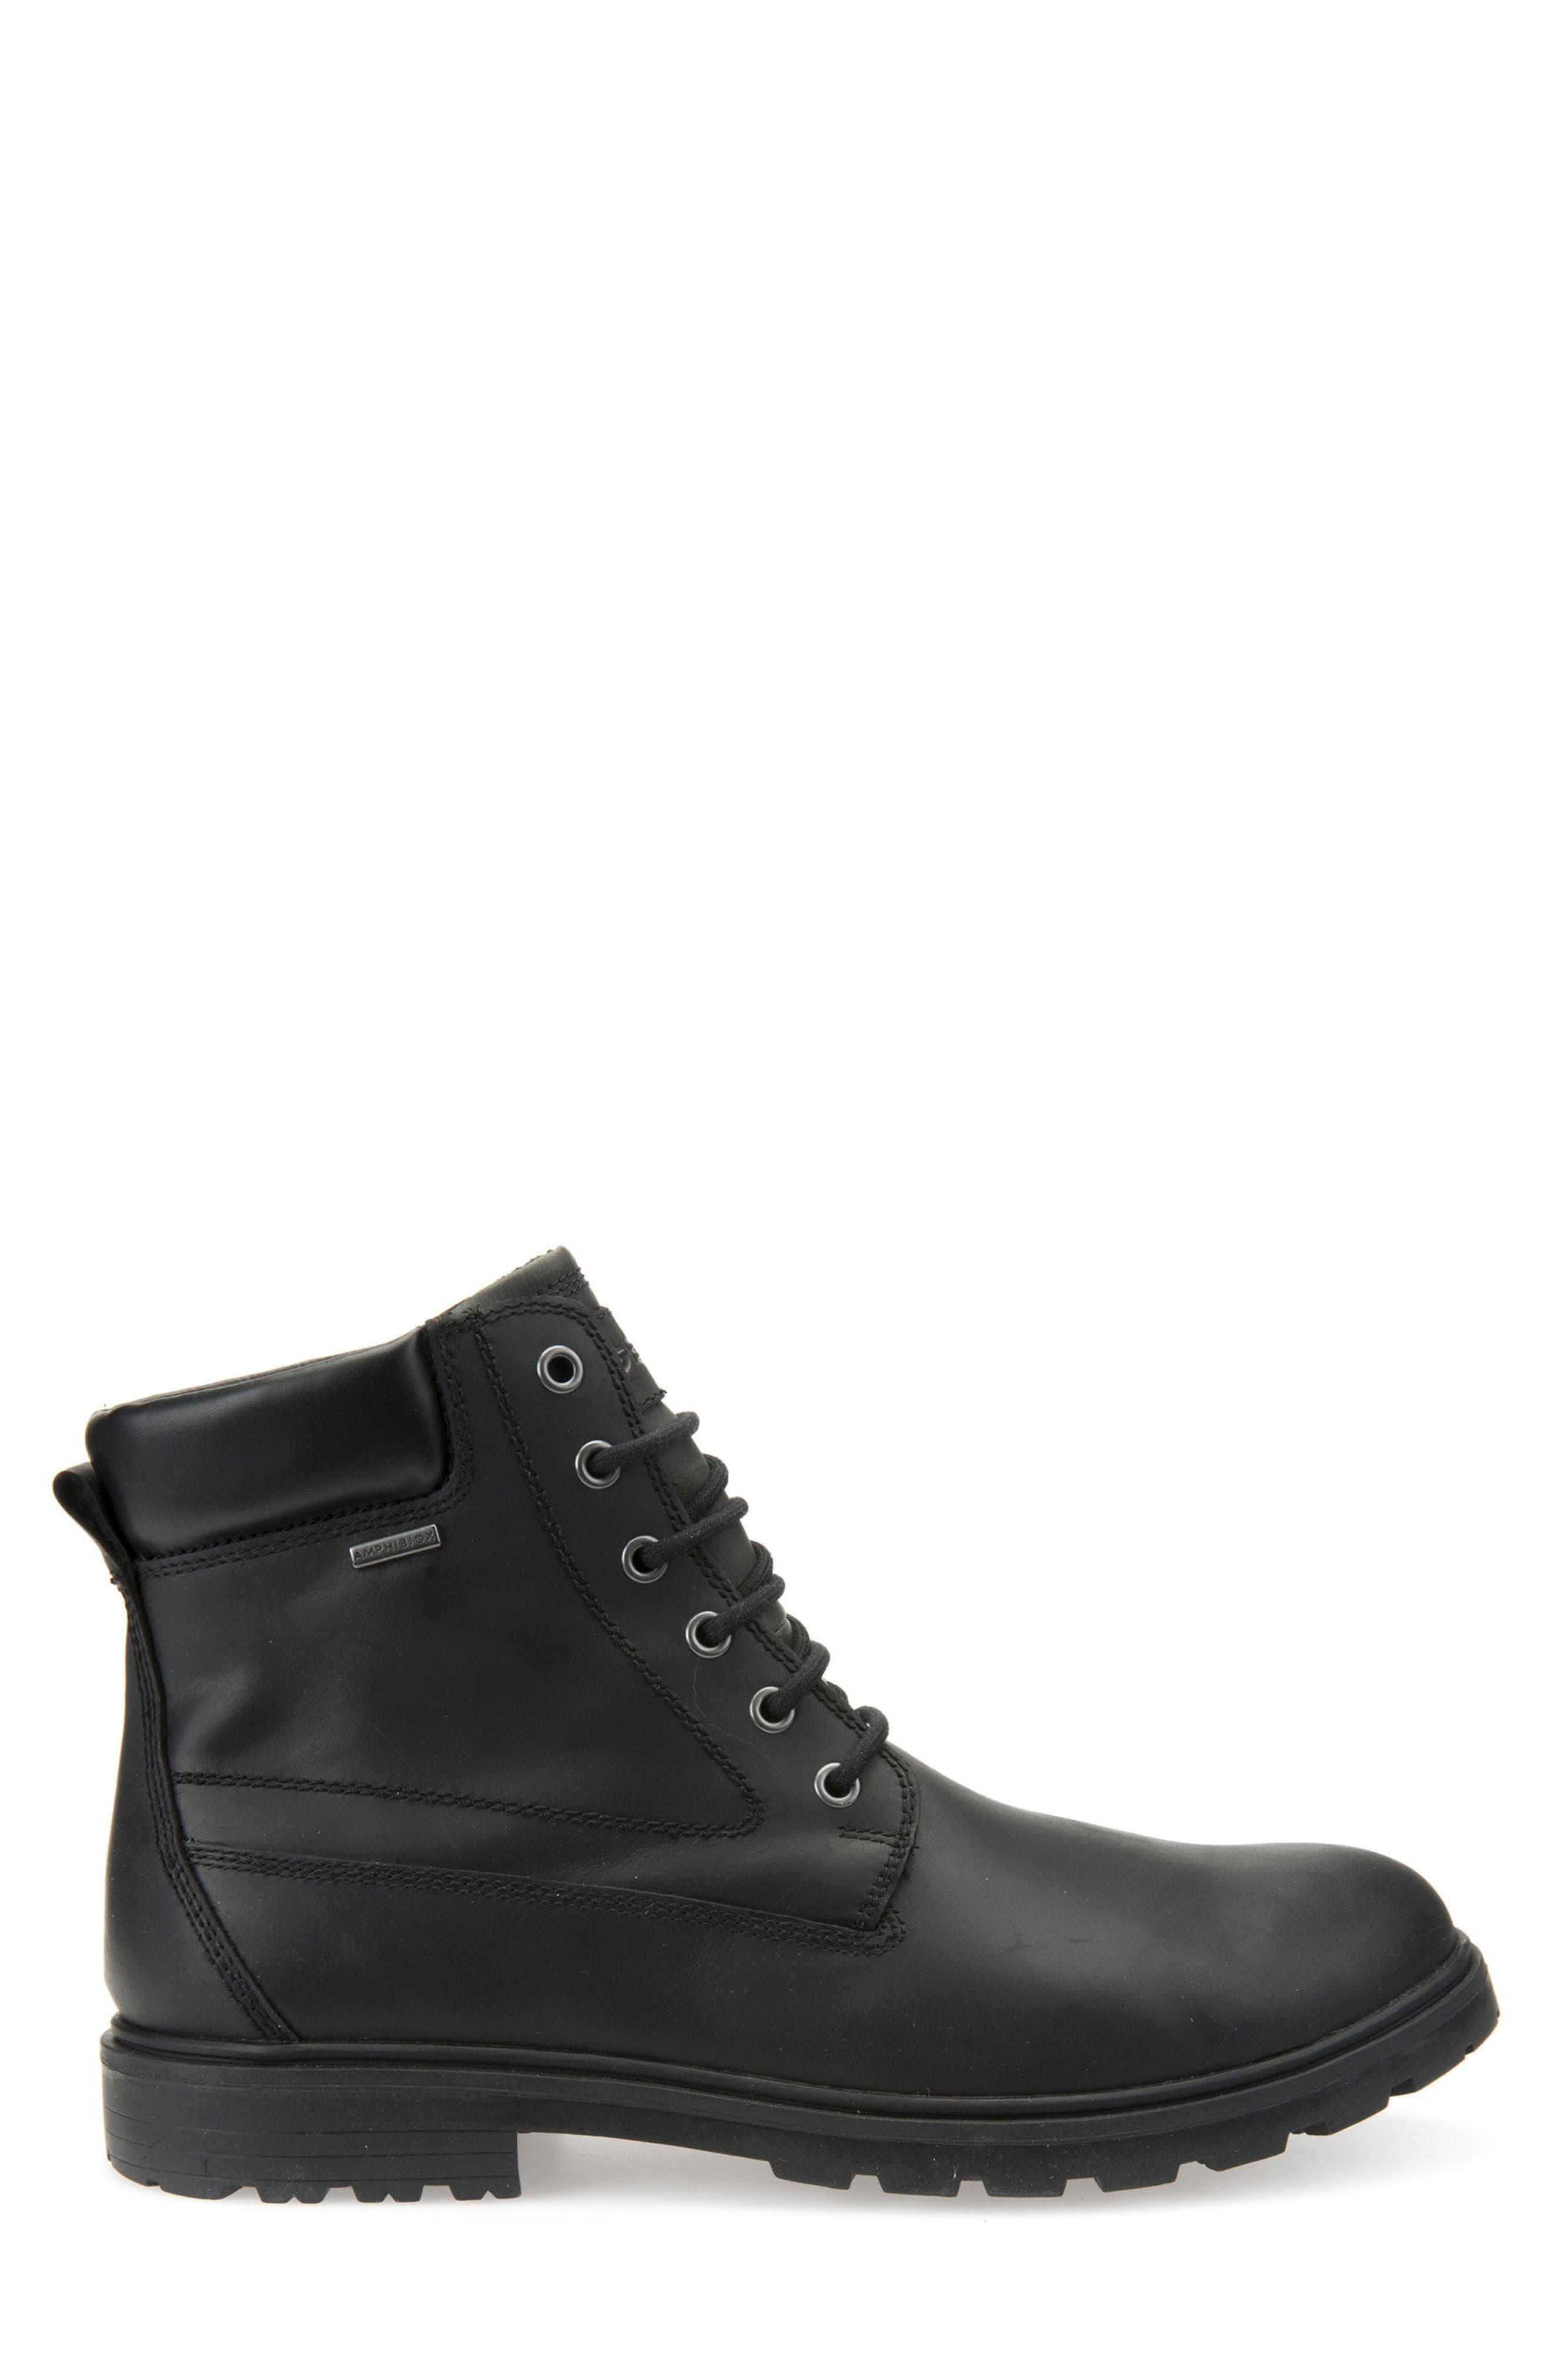 Makim Waterproof Plain Toe Boot,                             Alternate thumbnail 3, color,                             001